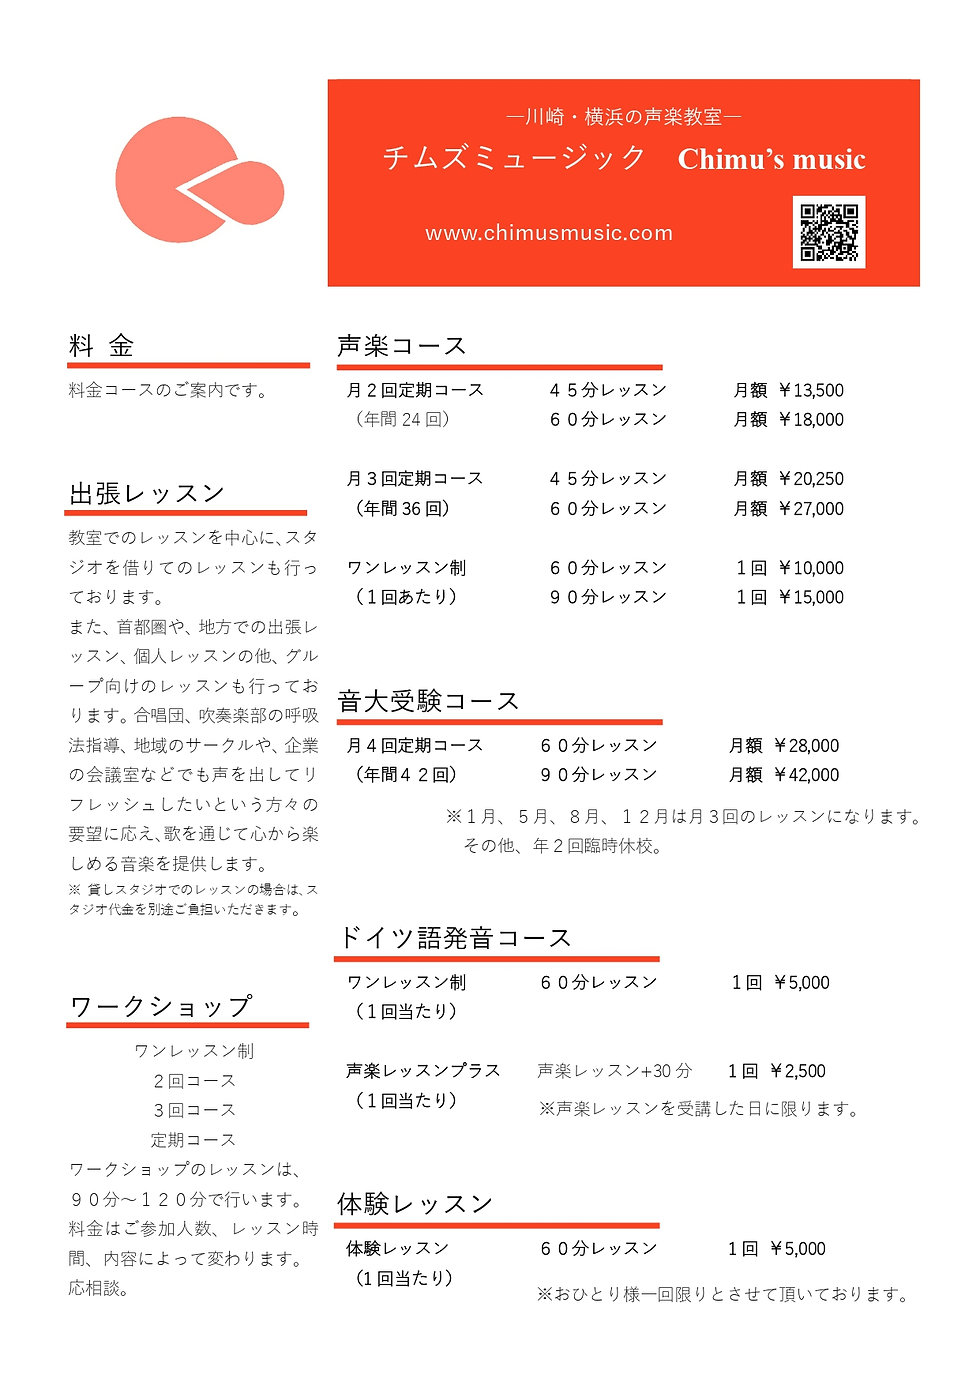 Chimu's music料金表2020_page-0001.jpg